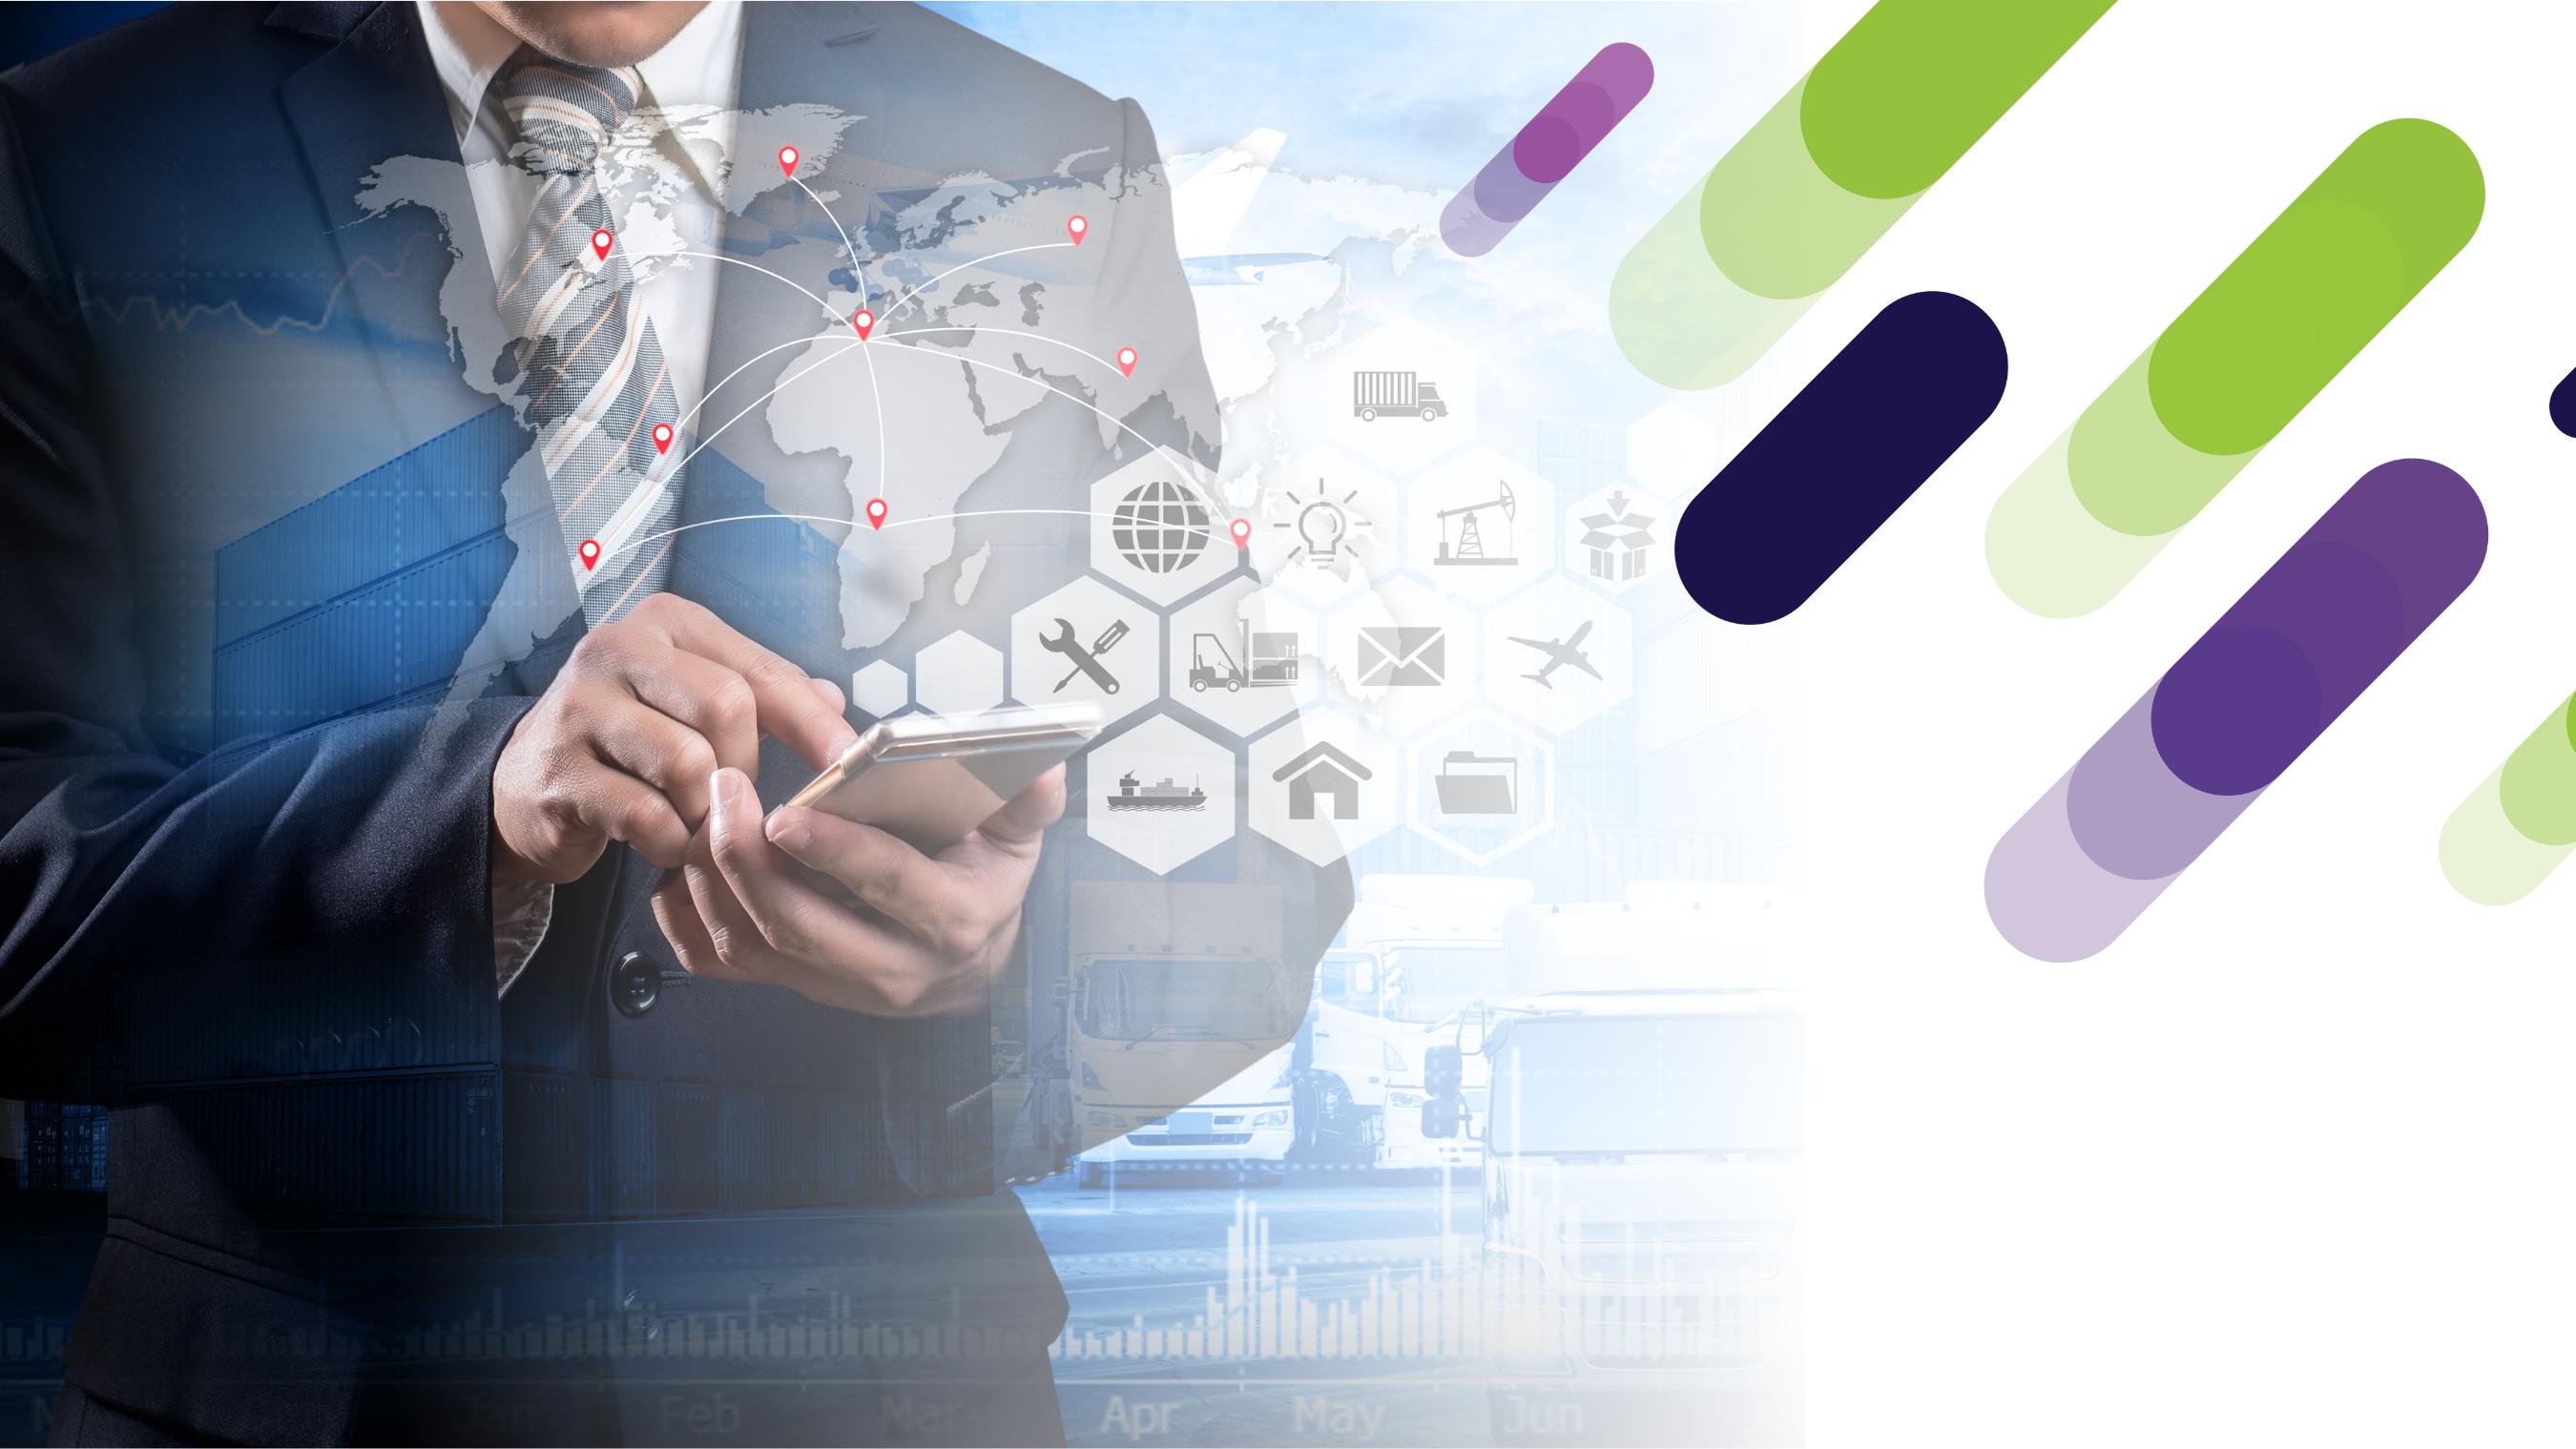 Identifying Gaps in Vein-to-Vein Tracking and Supply Chain Digitisation